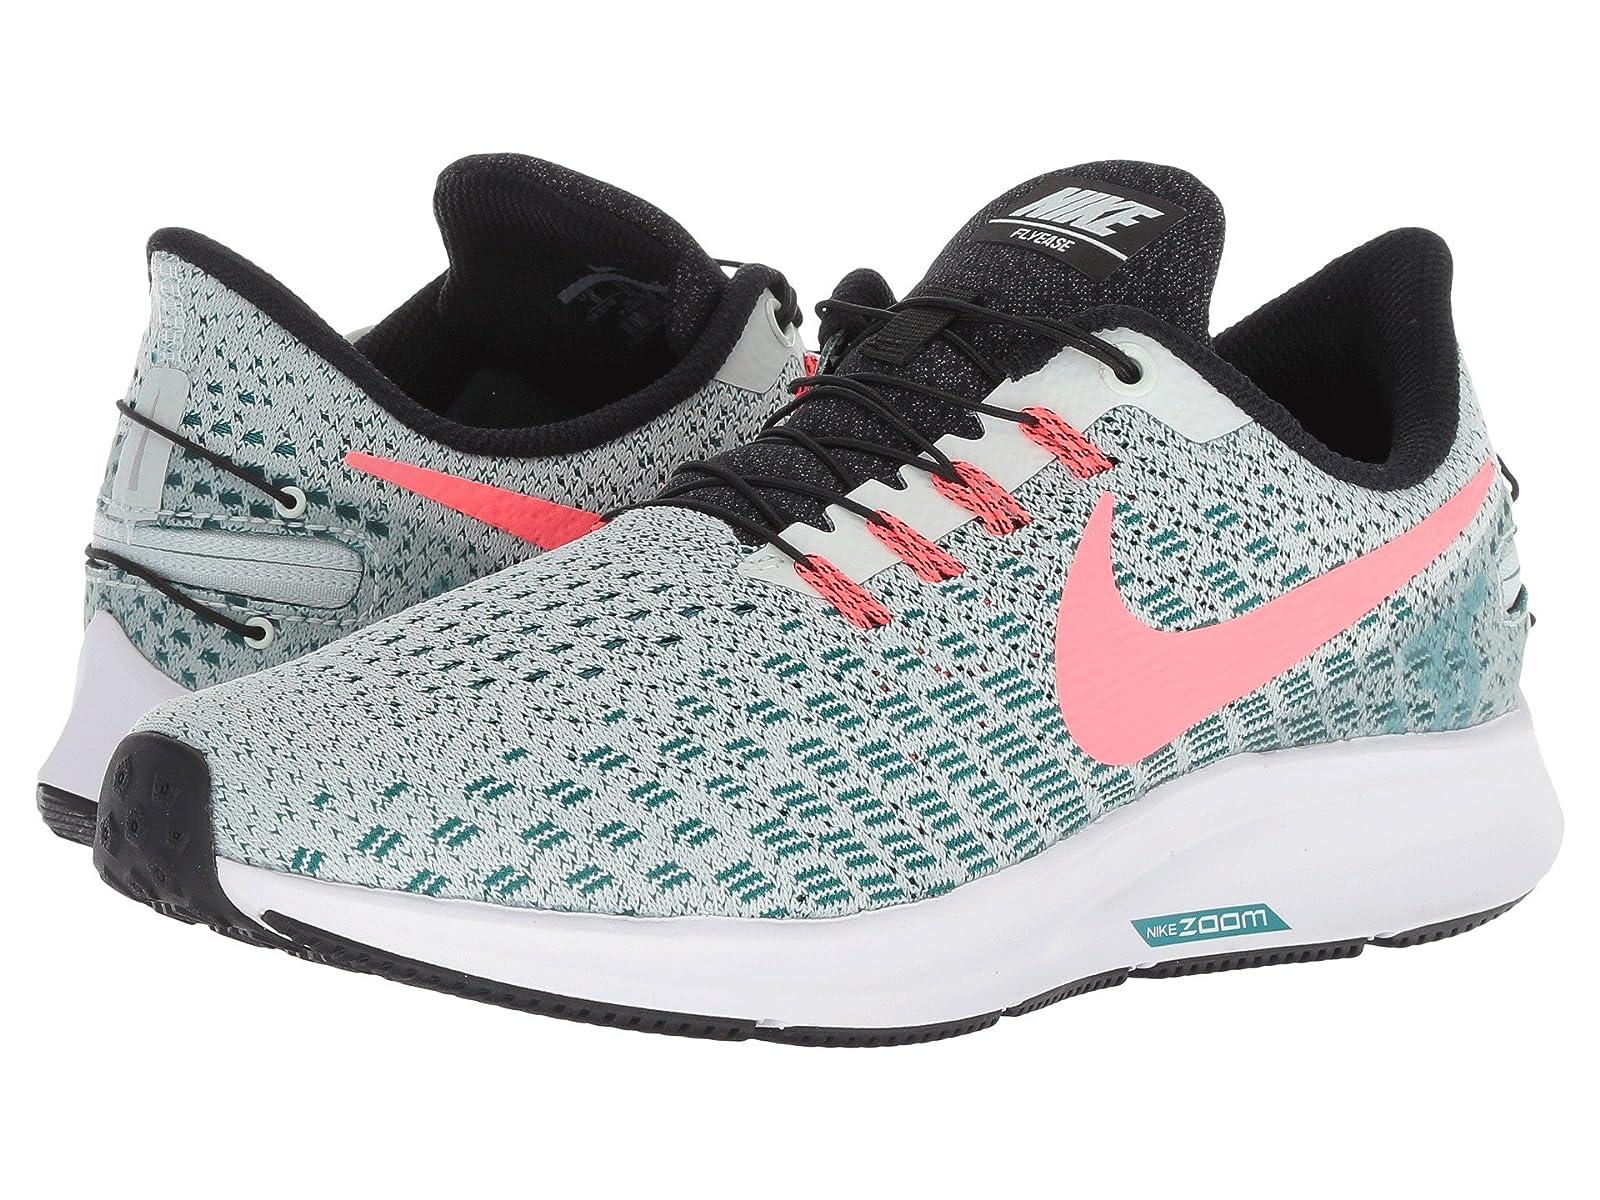 Nike Air Zoom Pegasus 35 FlyEaseAtmospheric grades have affordable shoes